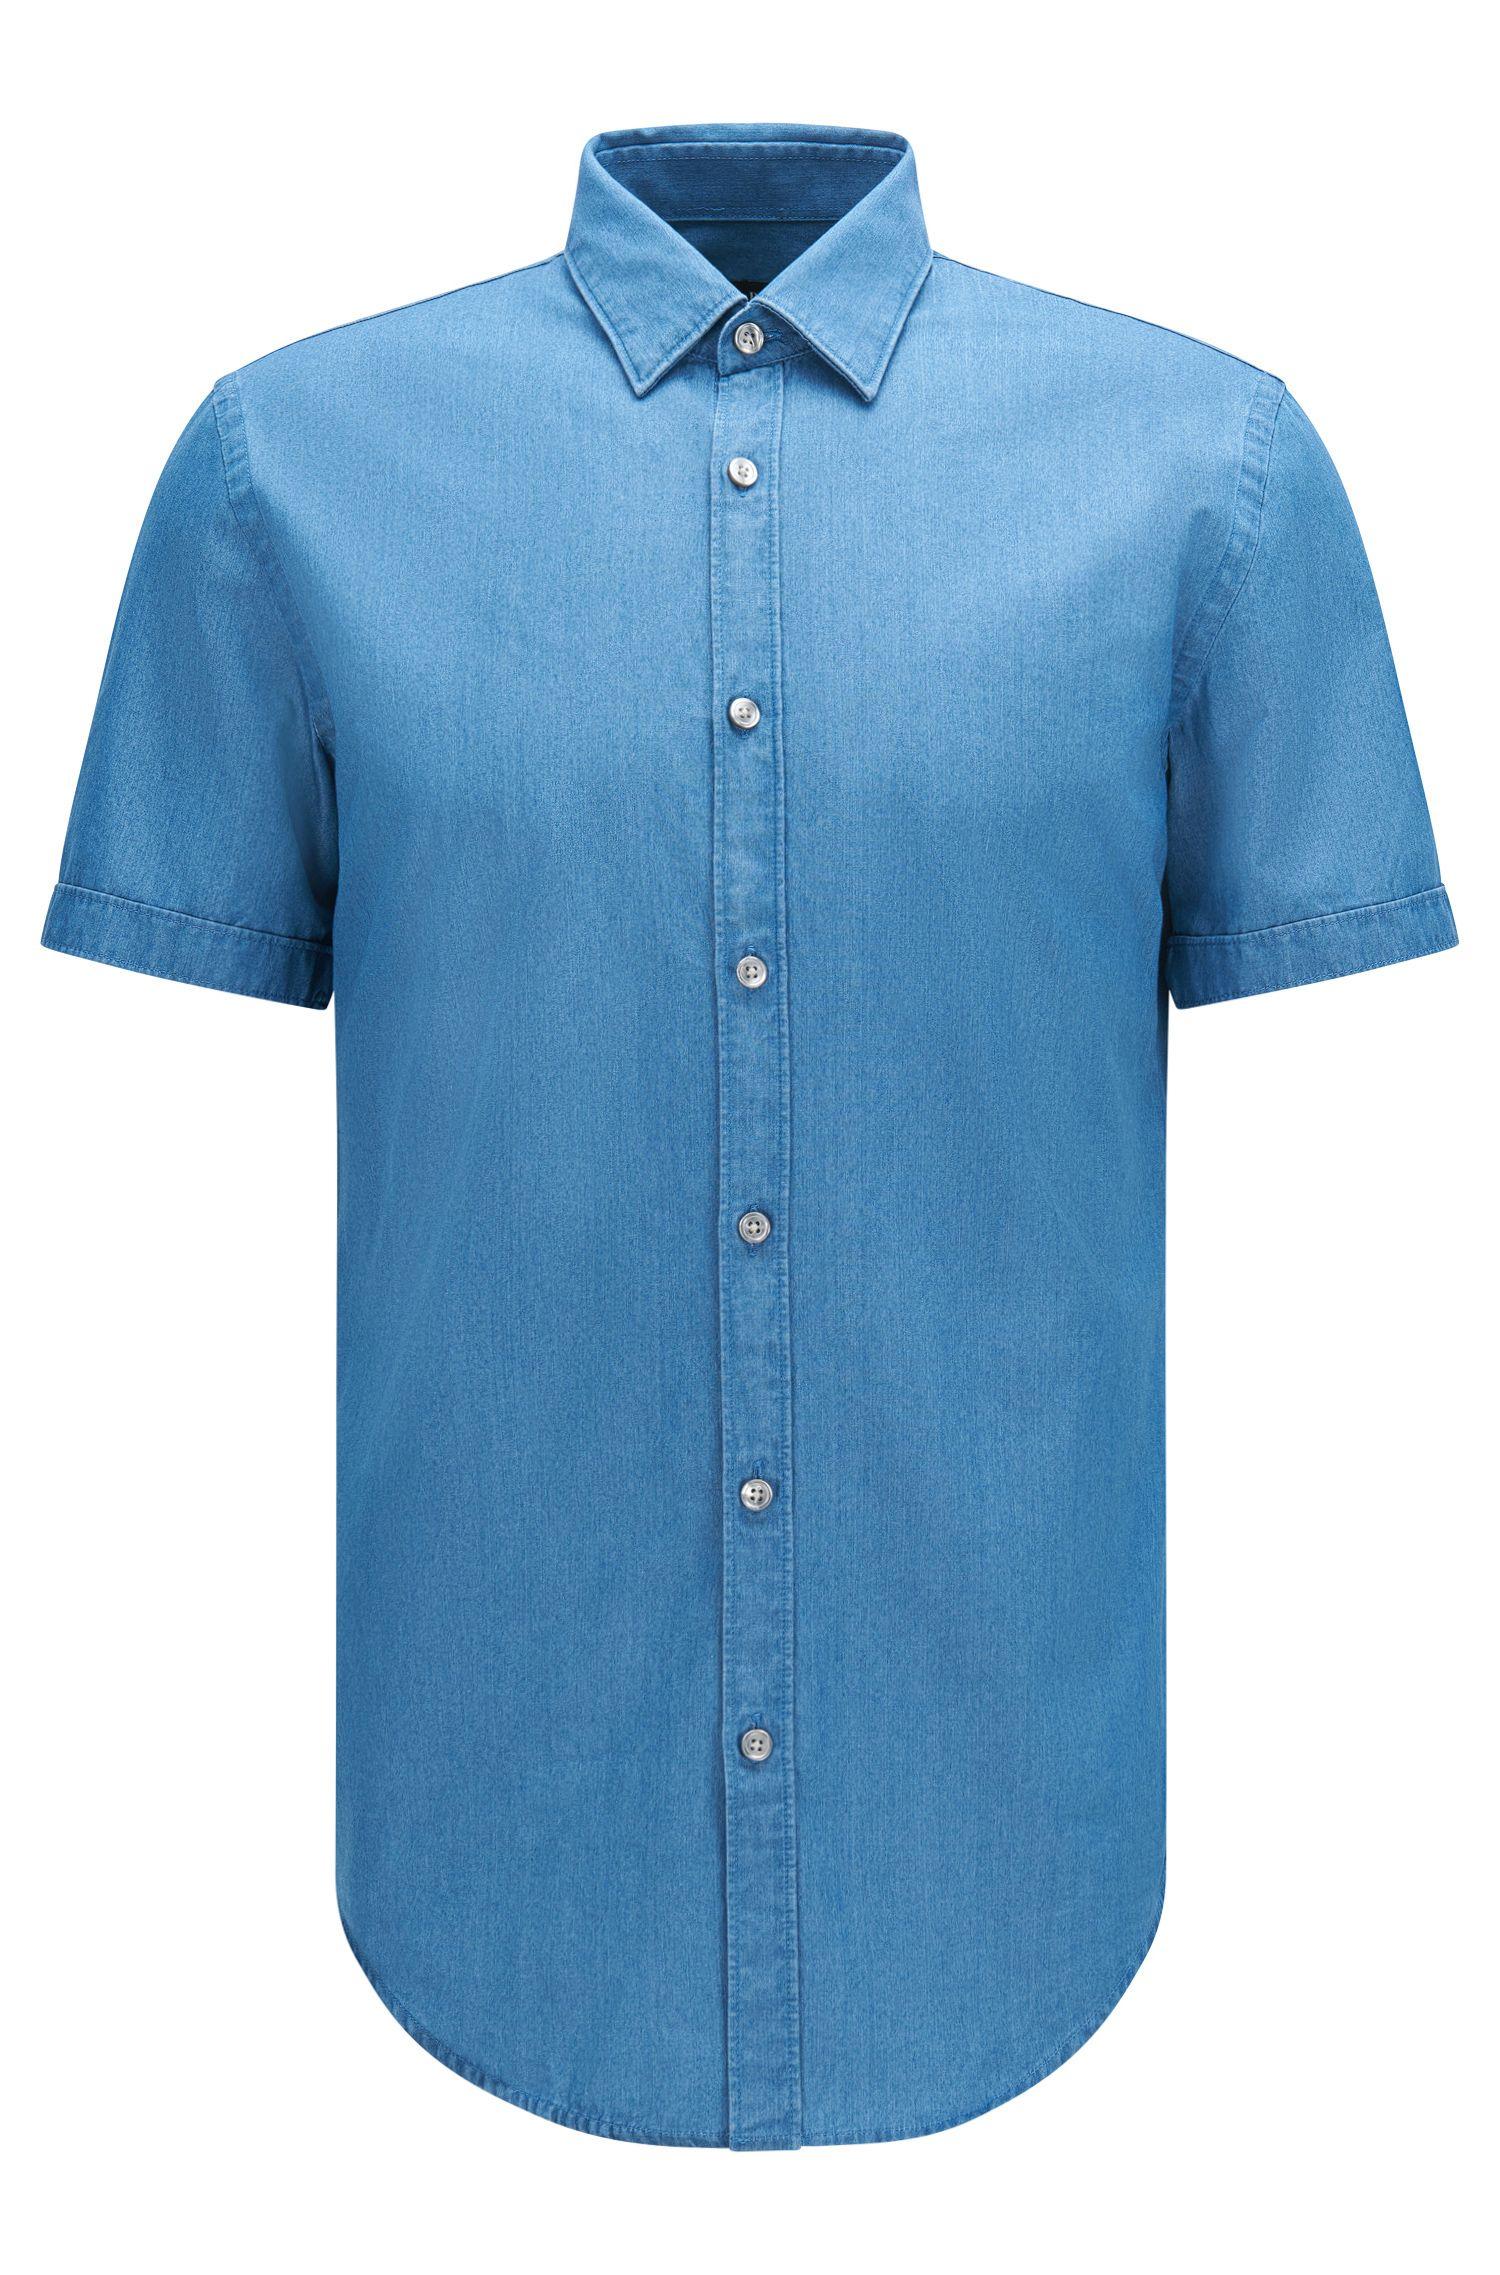 Cotton Button Down Shirt, Slim Fit | Ronn, Turquoise